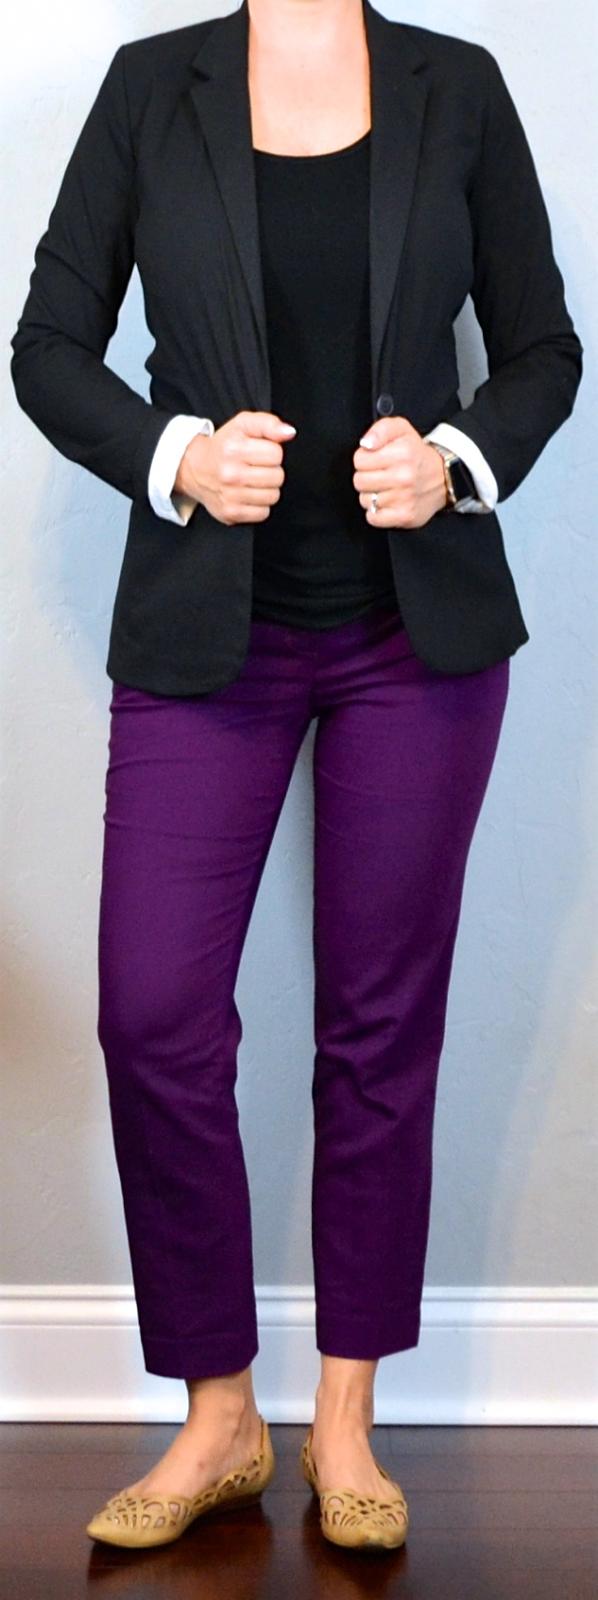 8c4a7-purplepantsblackblazer